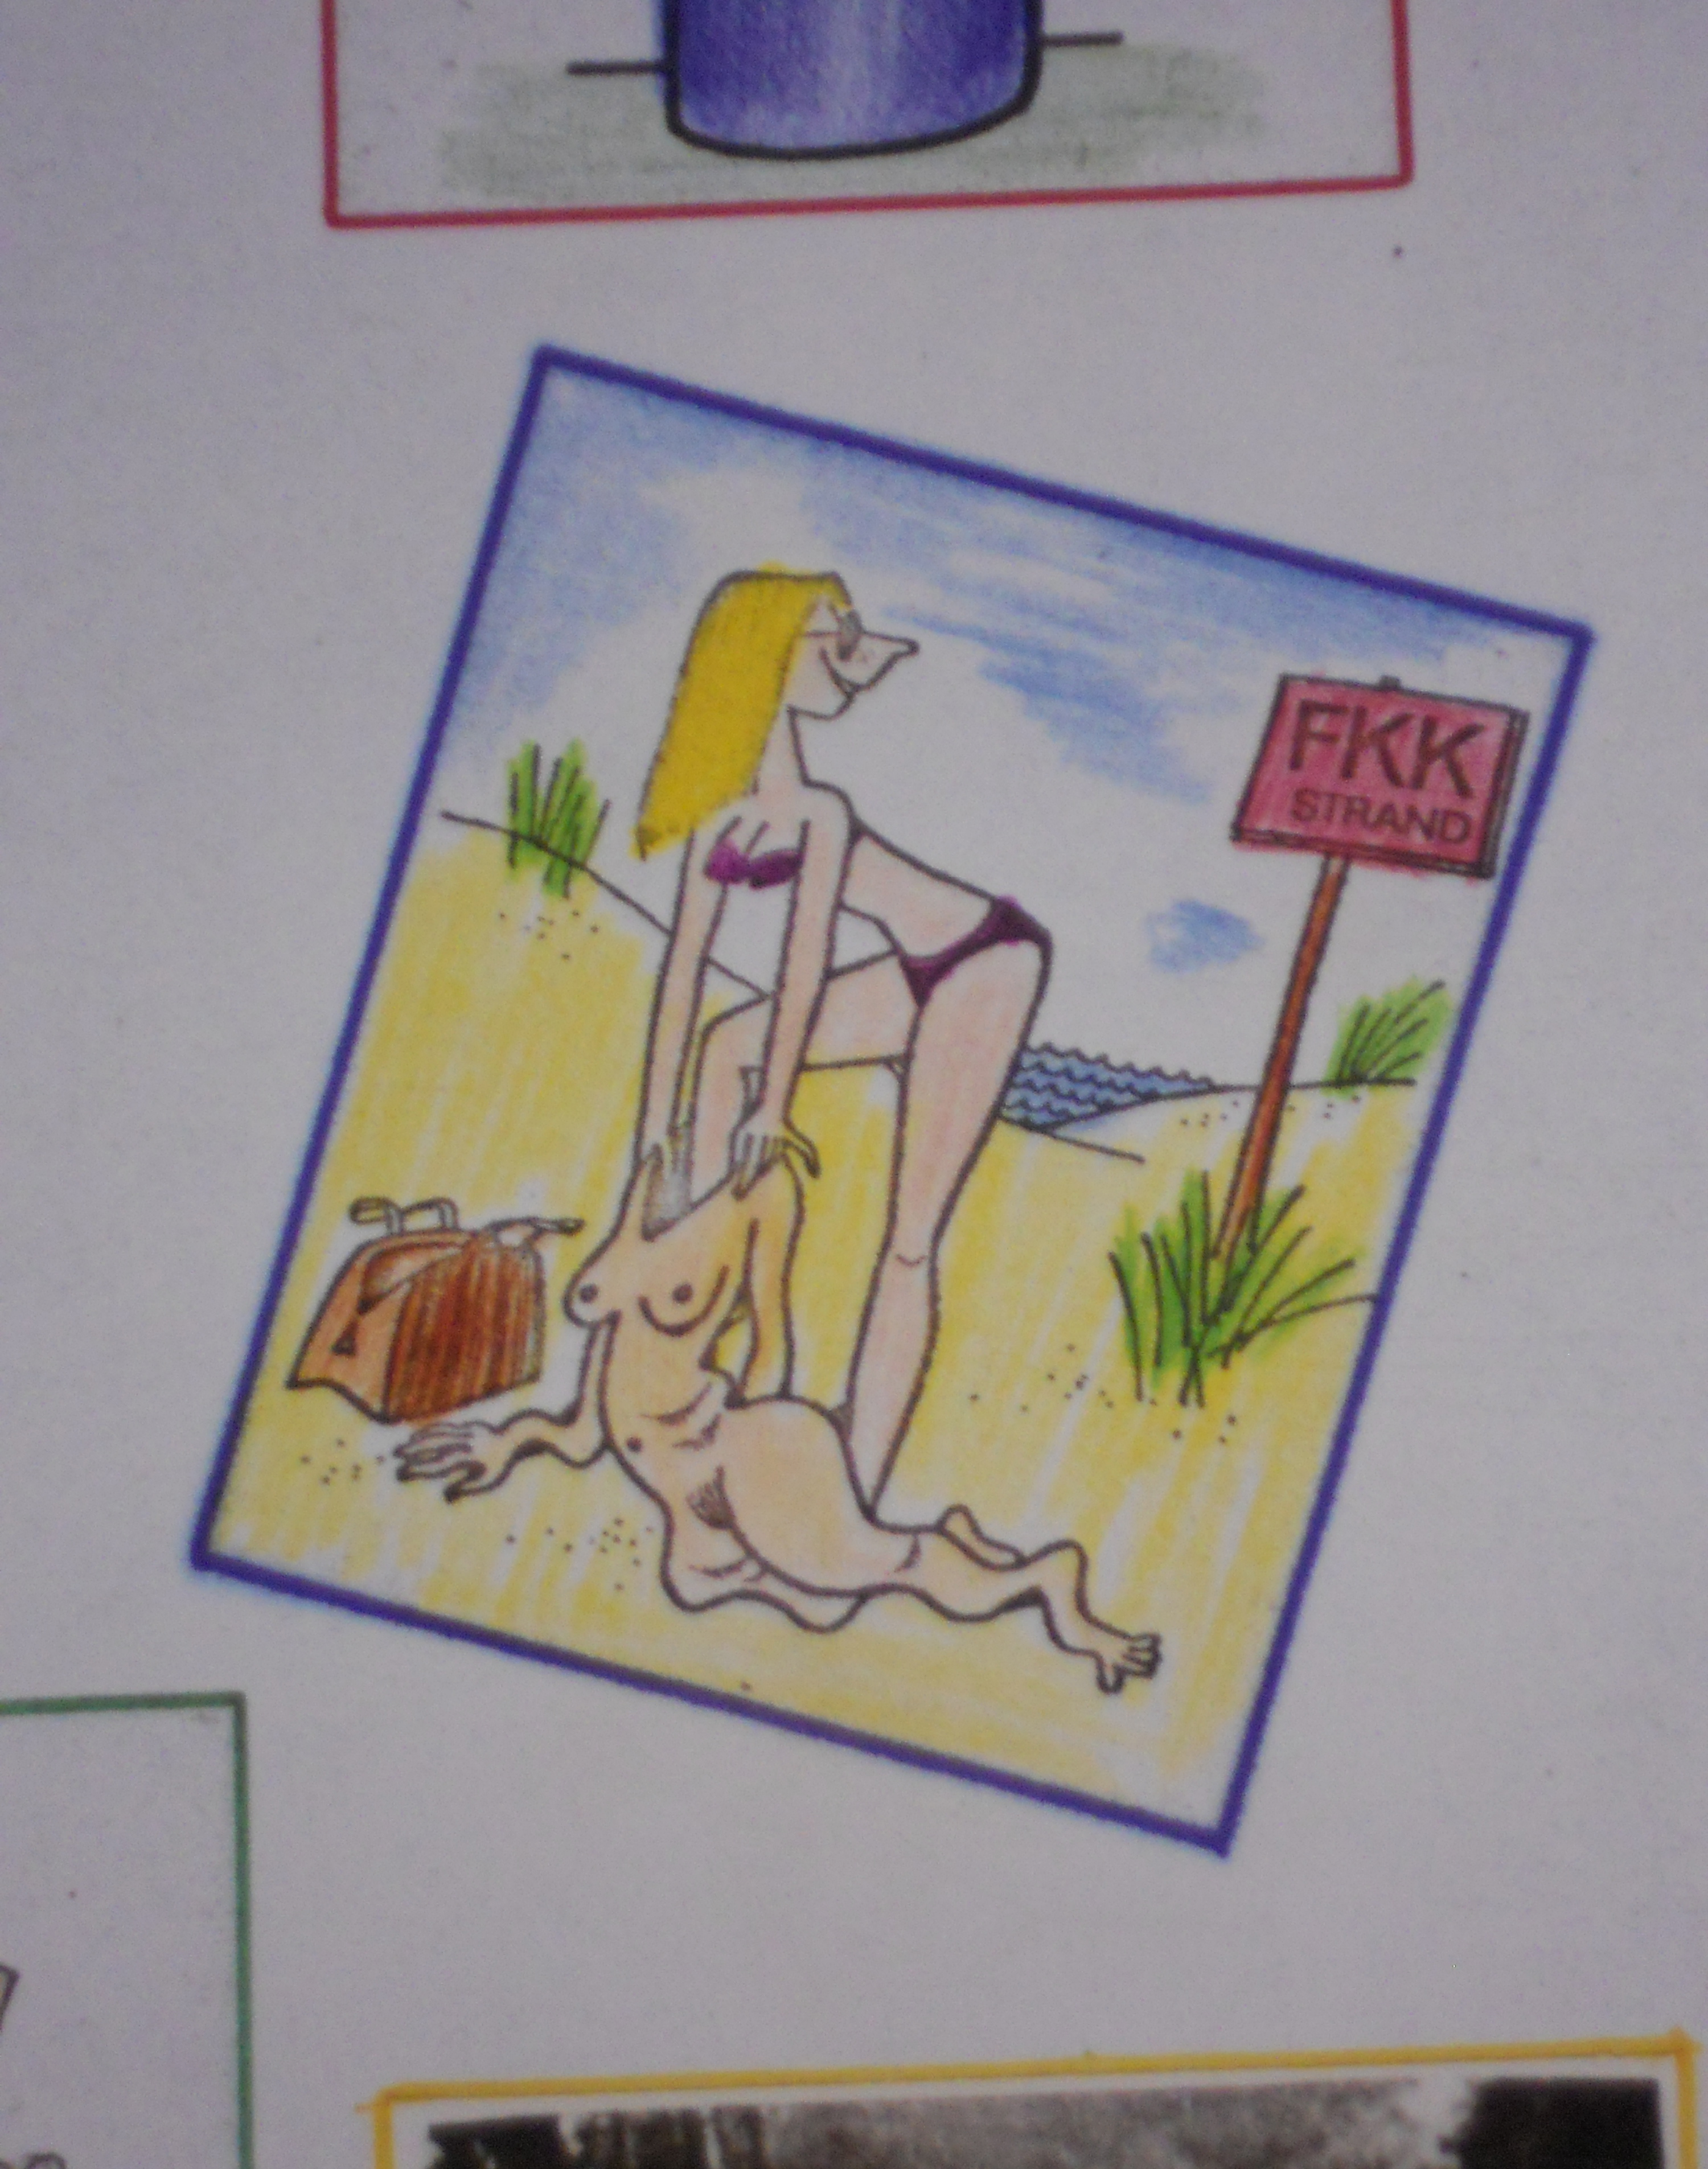 Fkk zeitschriften vintage fkk nude galleries